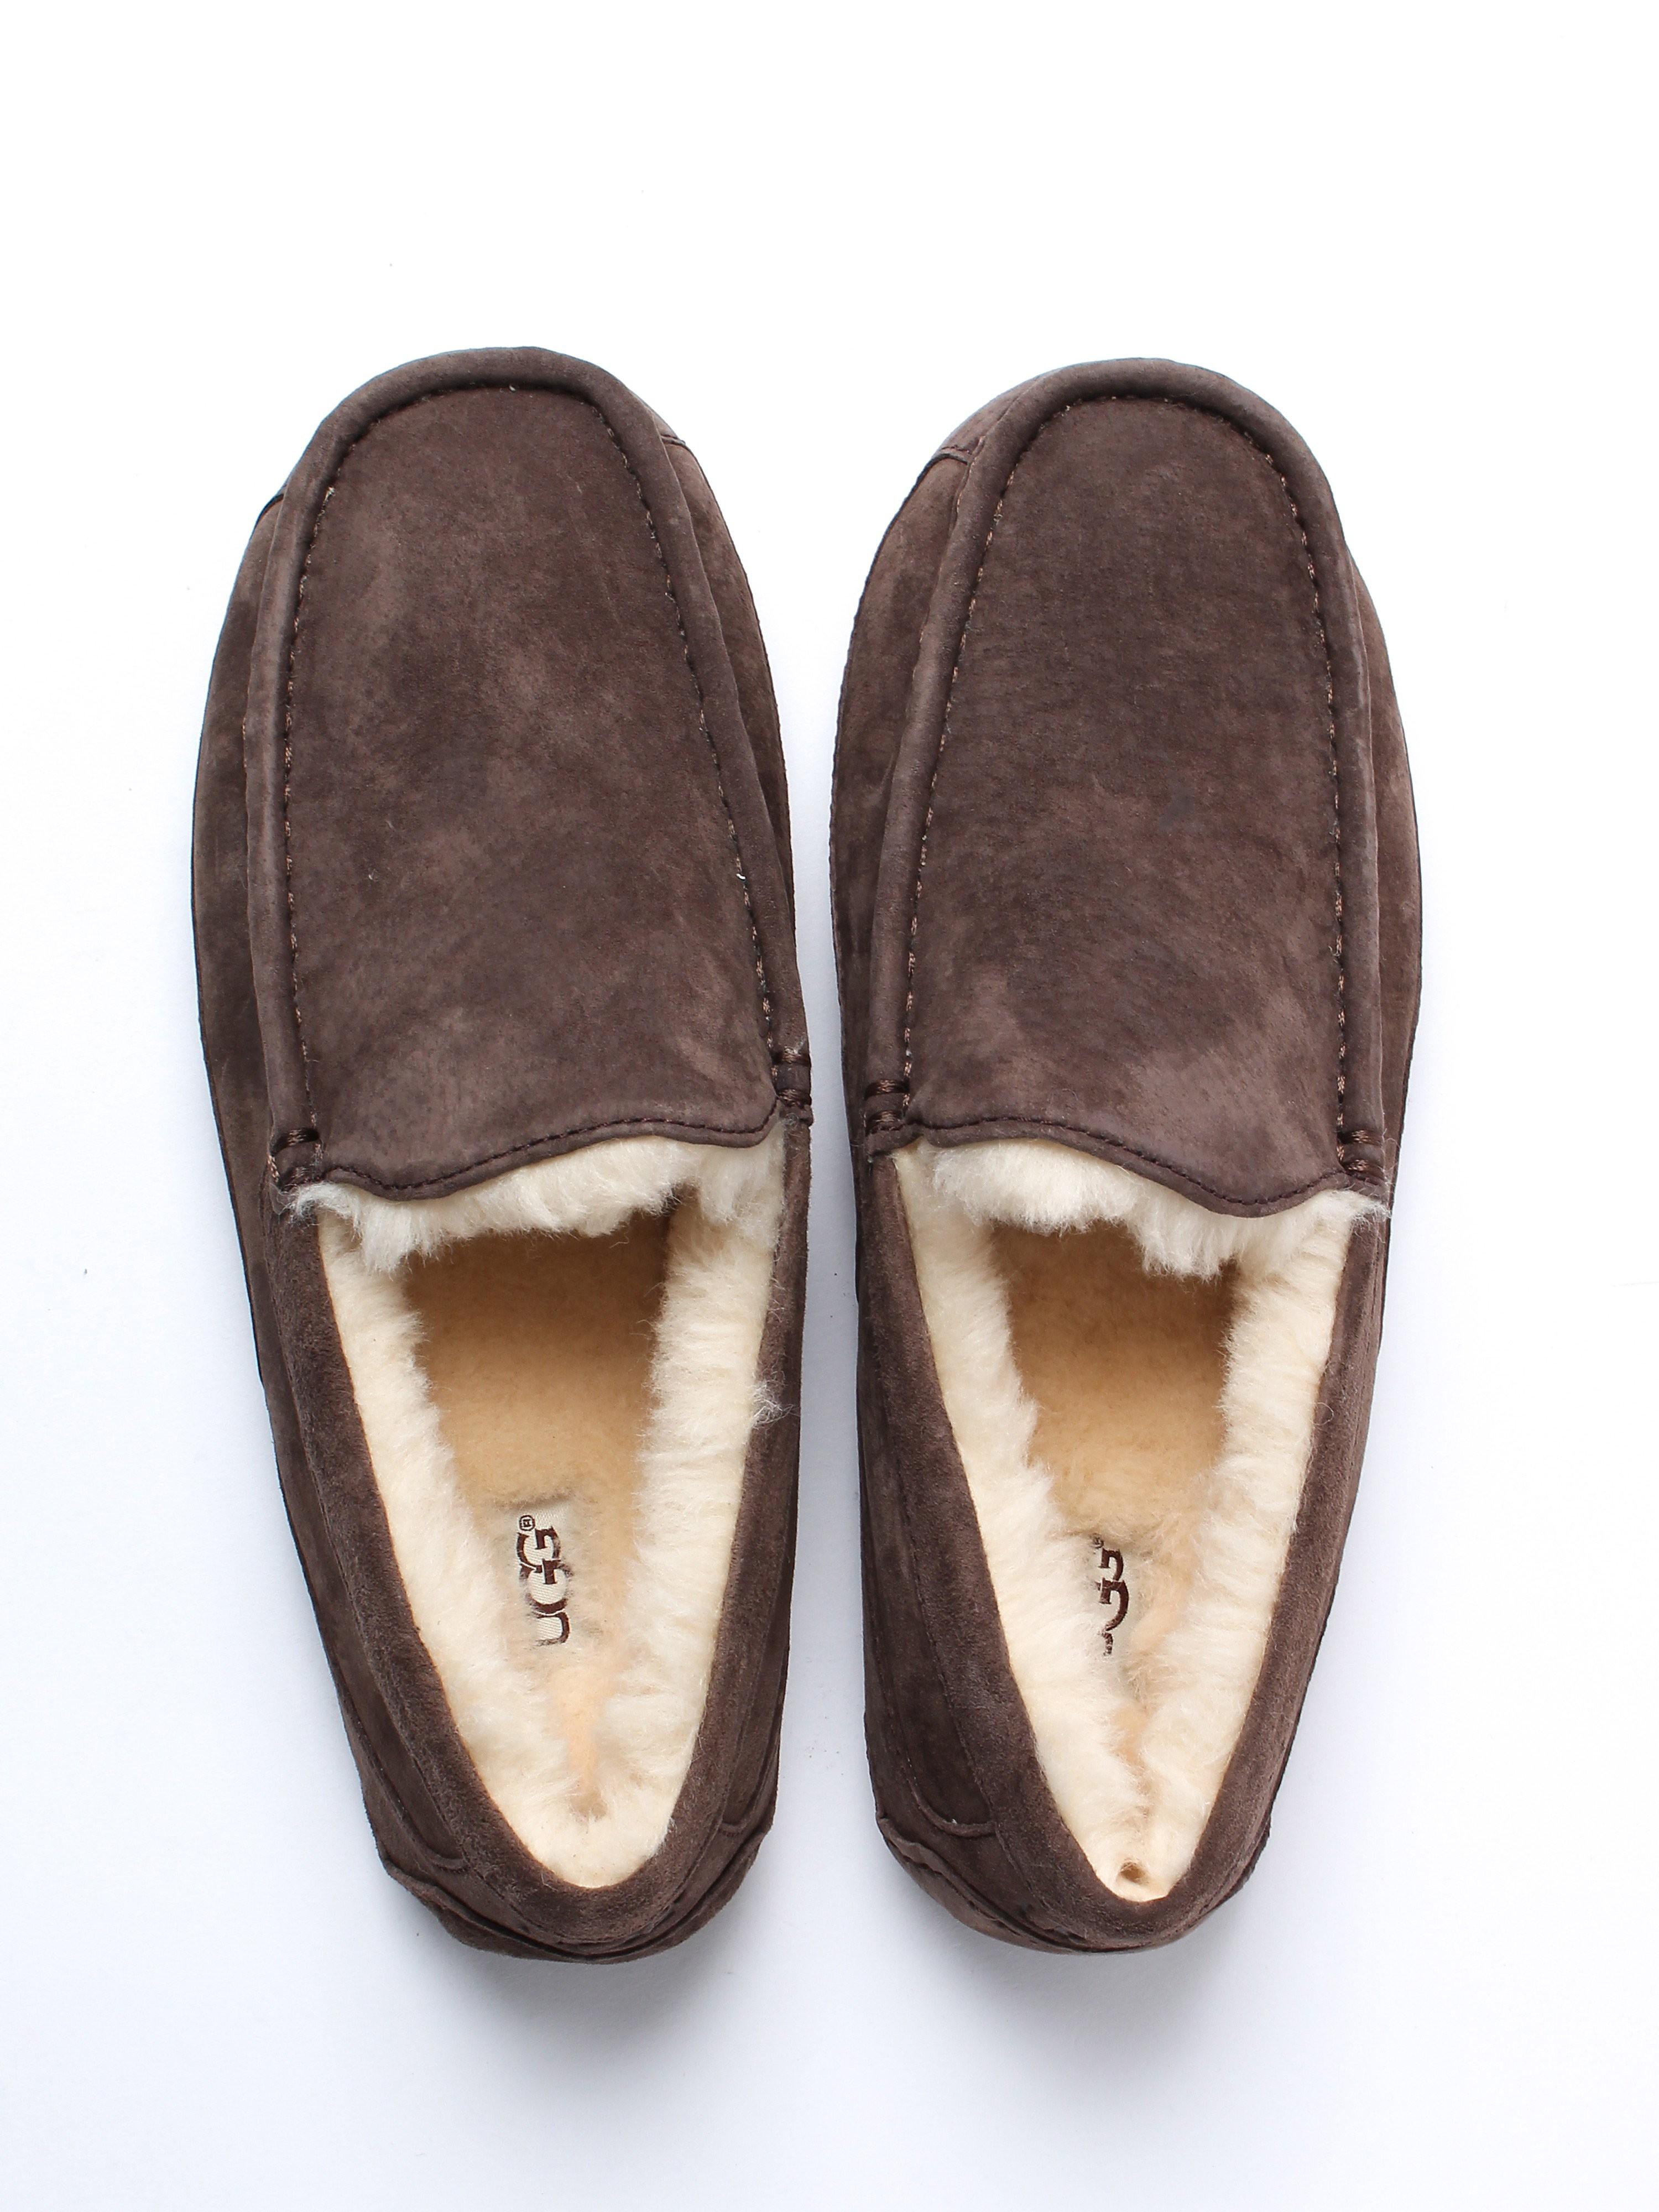 UGG Men's Ascot Sheepskin Slippers - Espresso